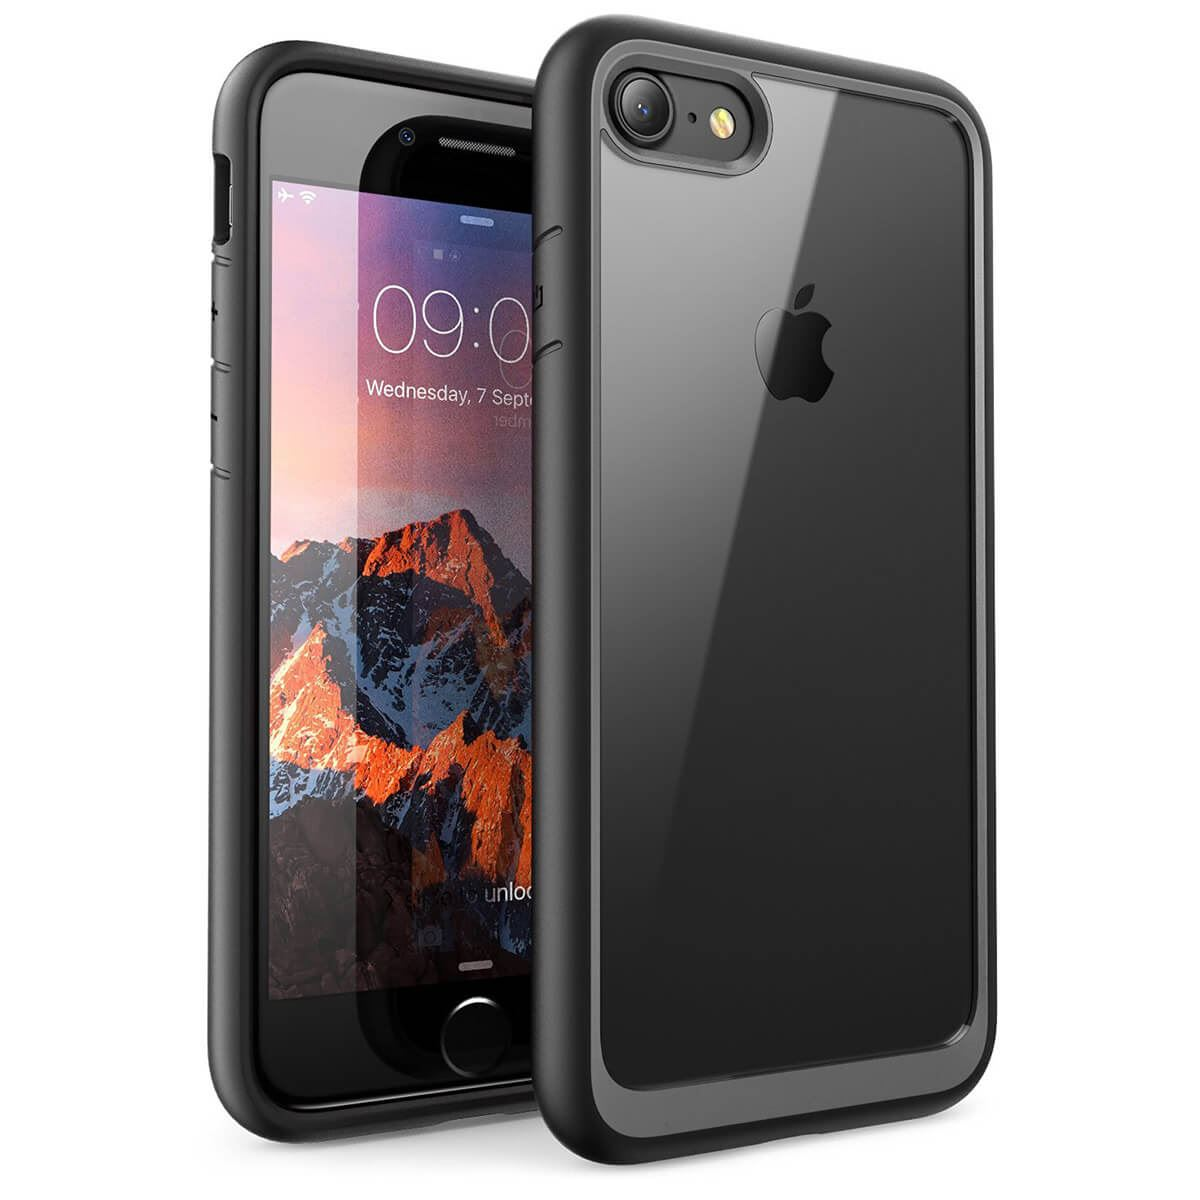 Shockproof-Bumper-Case-For-iPhone-X-XS-XR-6-Plus-7-Plus-6-Plus-Hard-Armor thumbnail 6